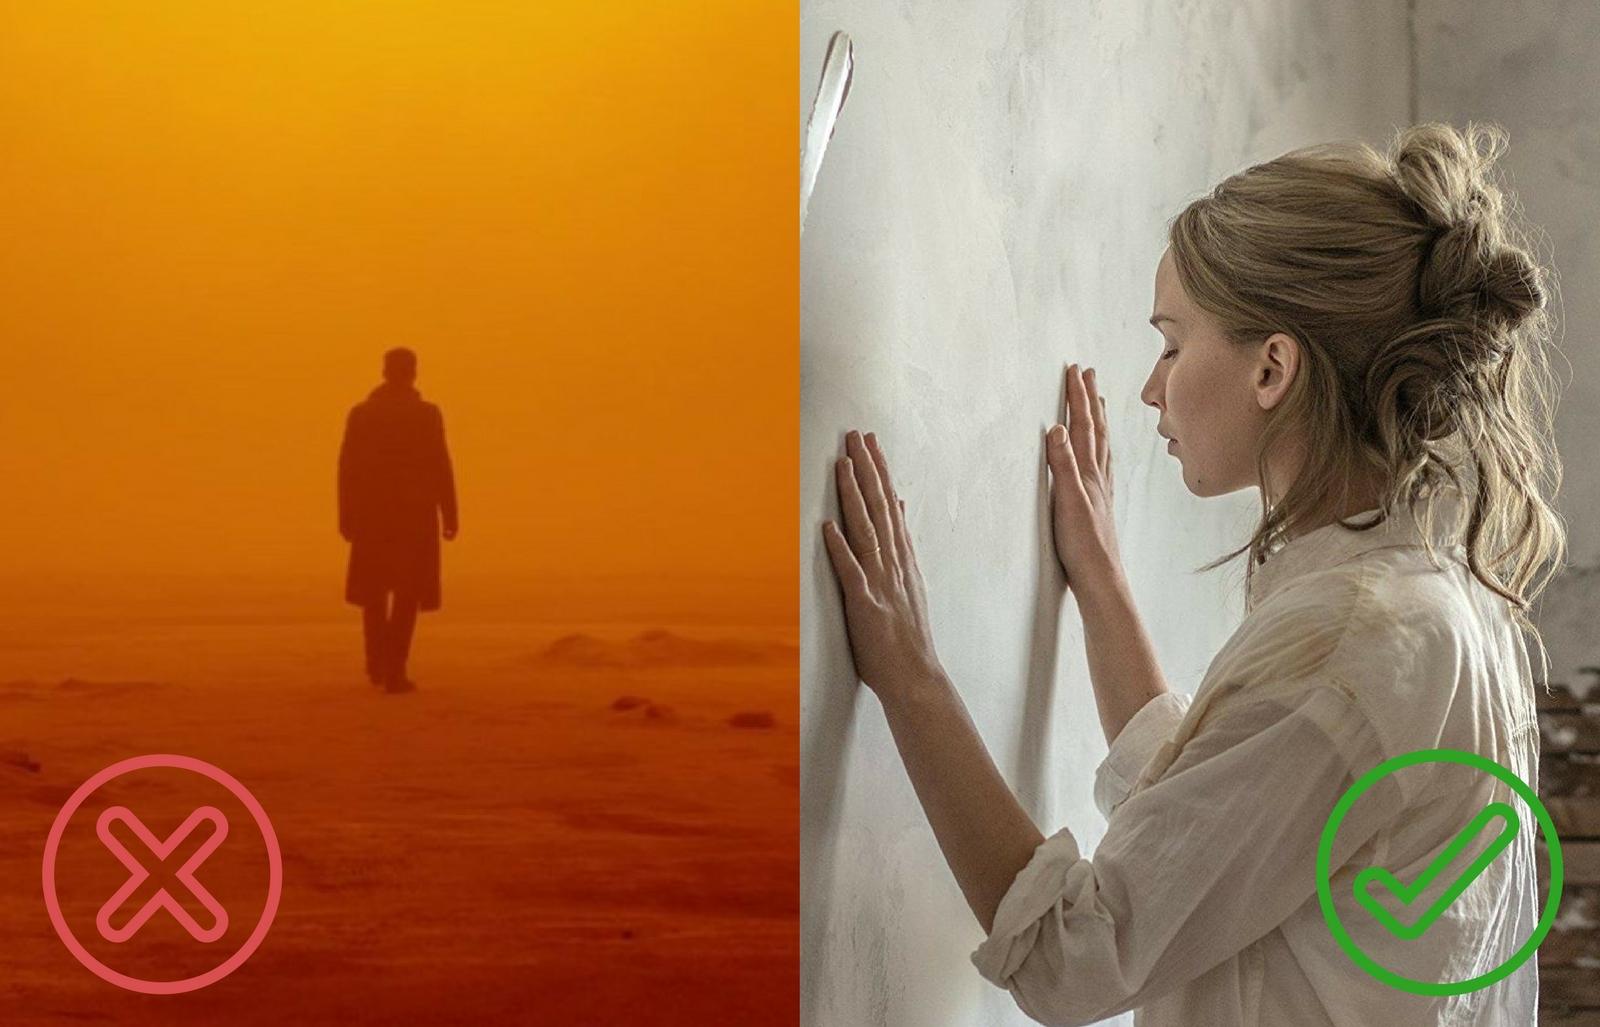 Blade Runner 2049, Pa asmeni skrejošais 2049; mother!, Māt!